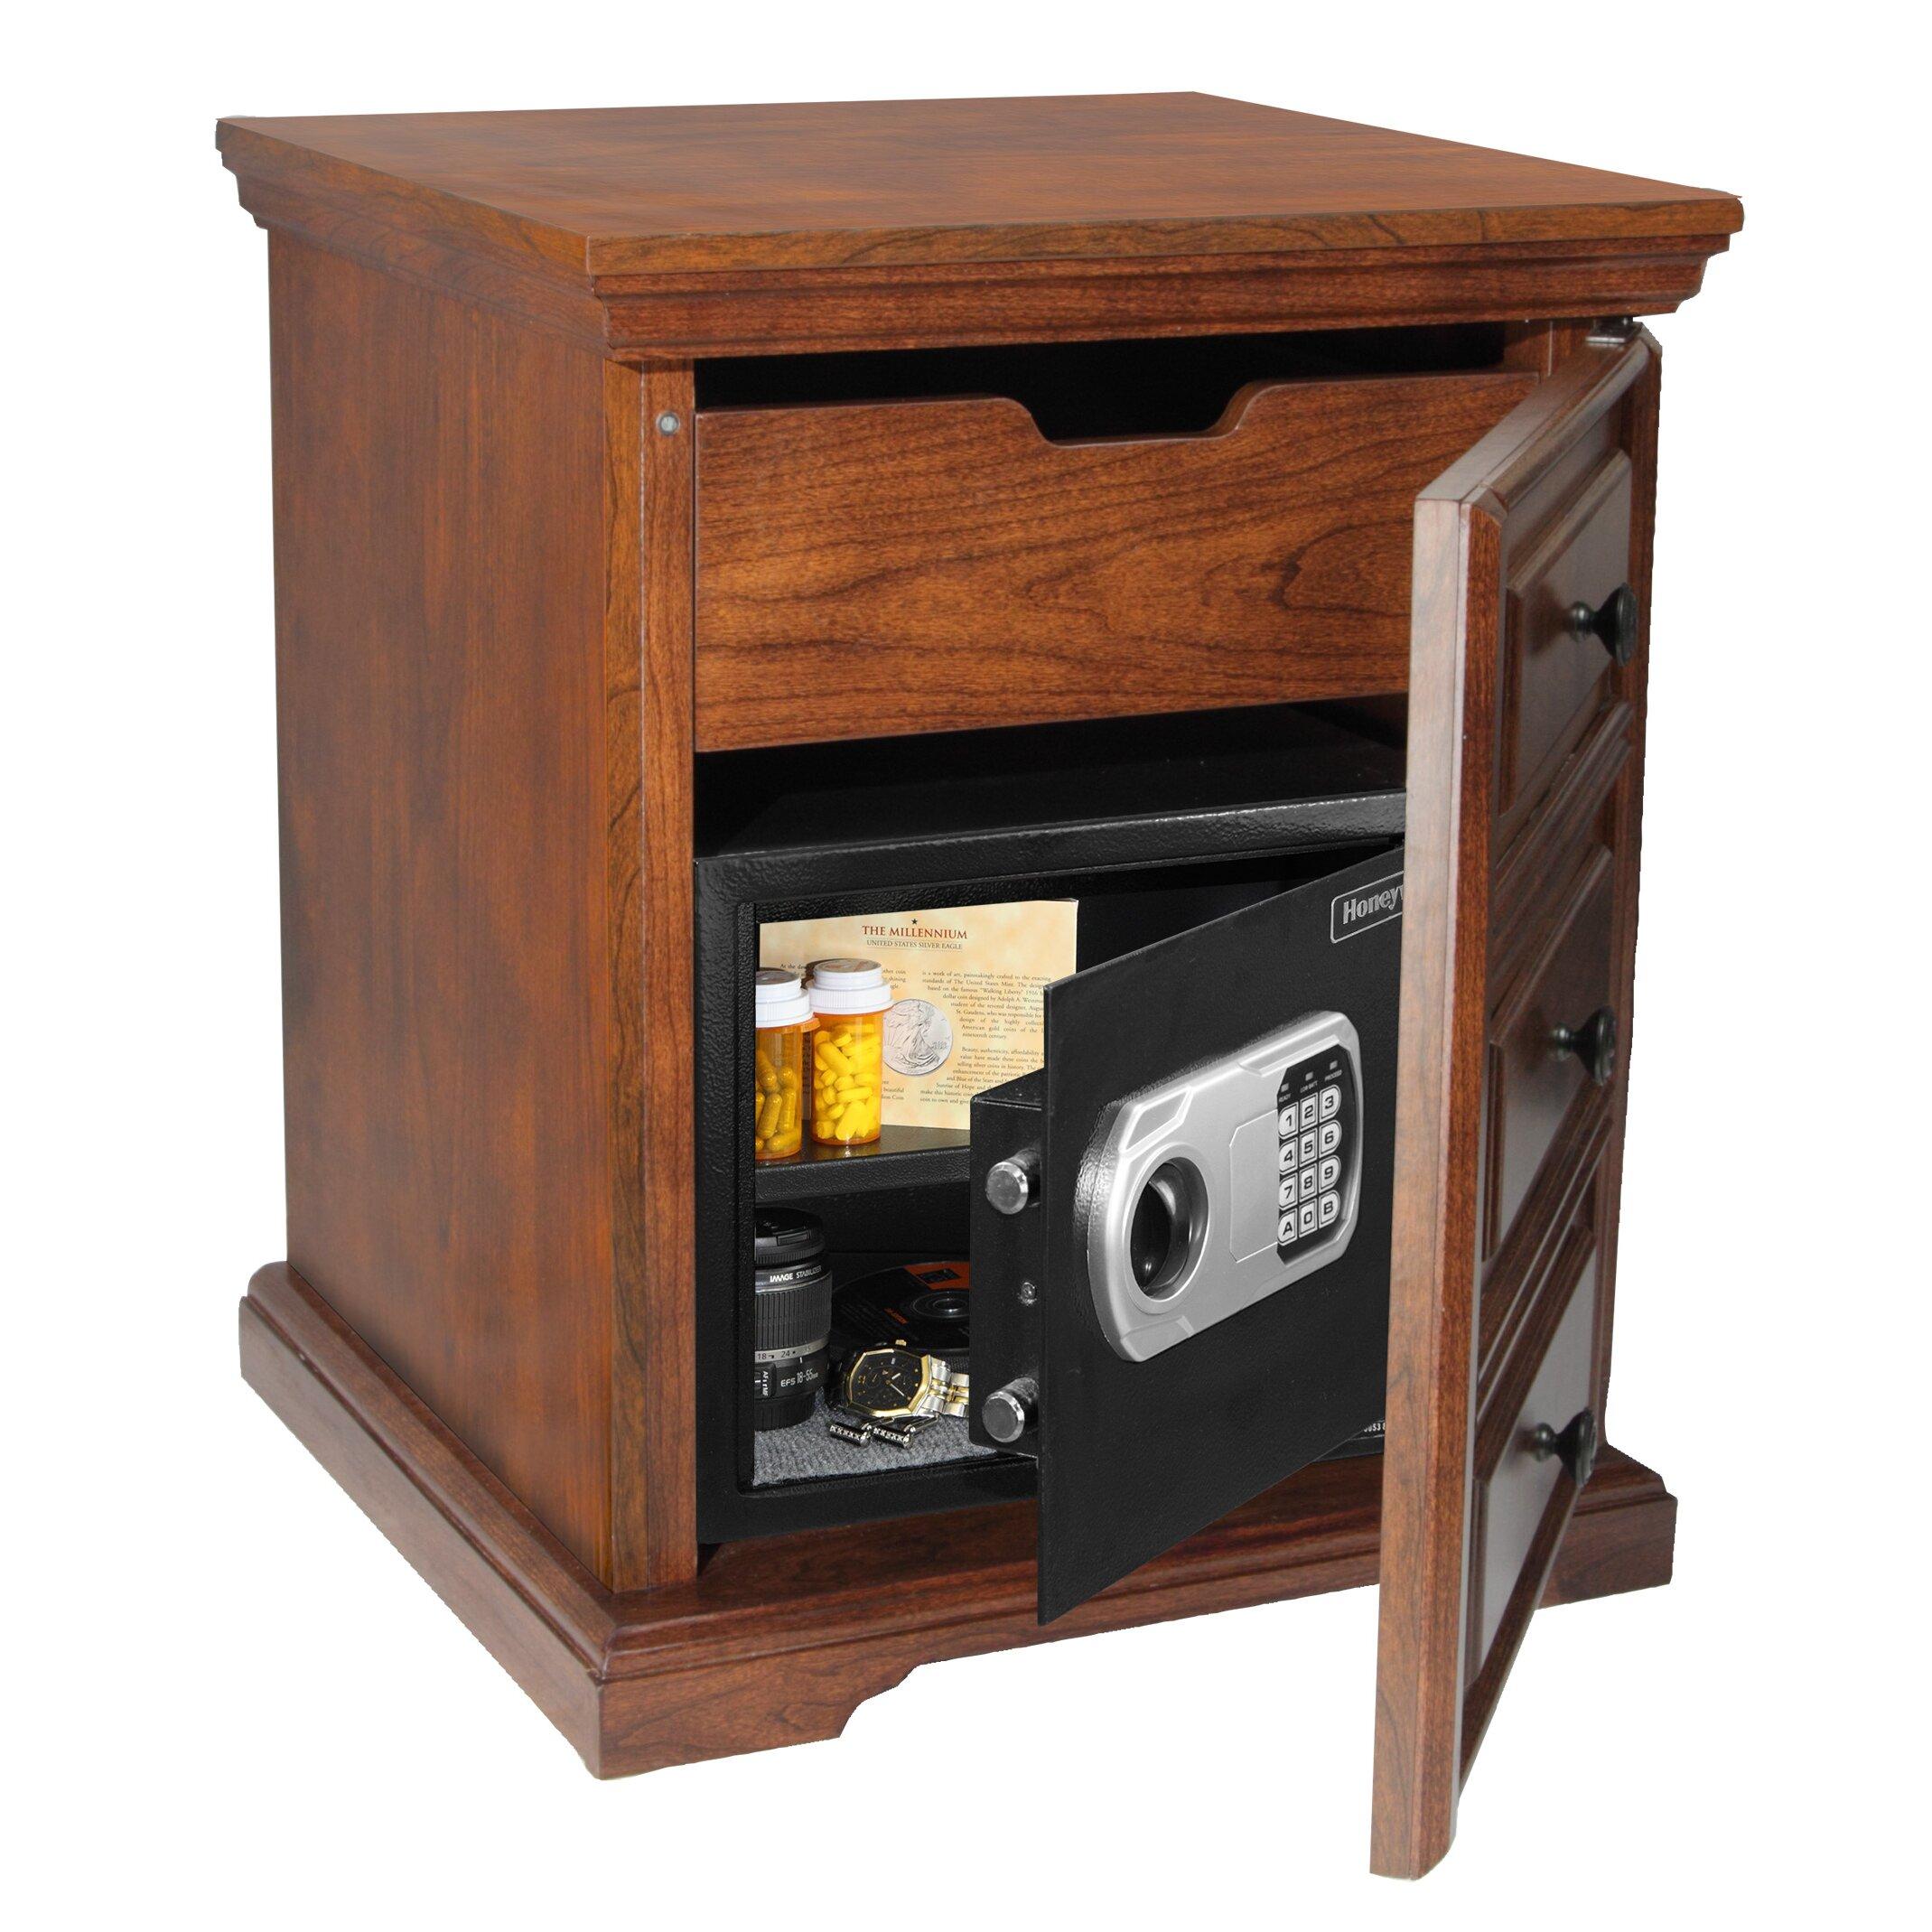 Woodmark Gun Cabinet Honeywell Steel Security Safe In Decorative Cabinet 083 Cuft